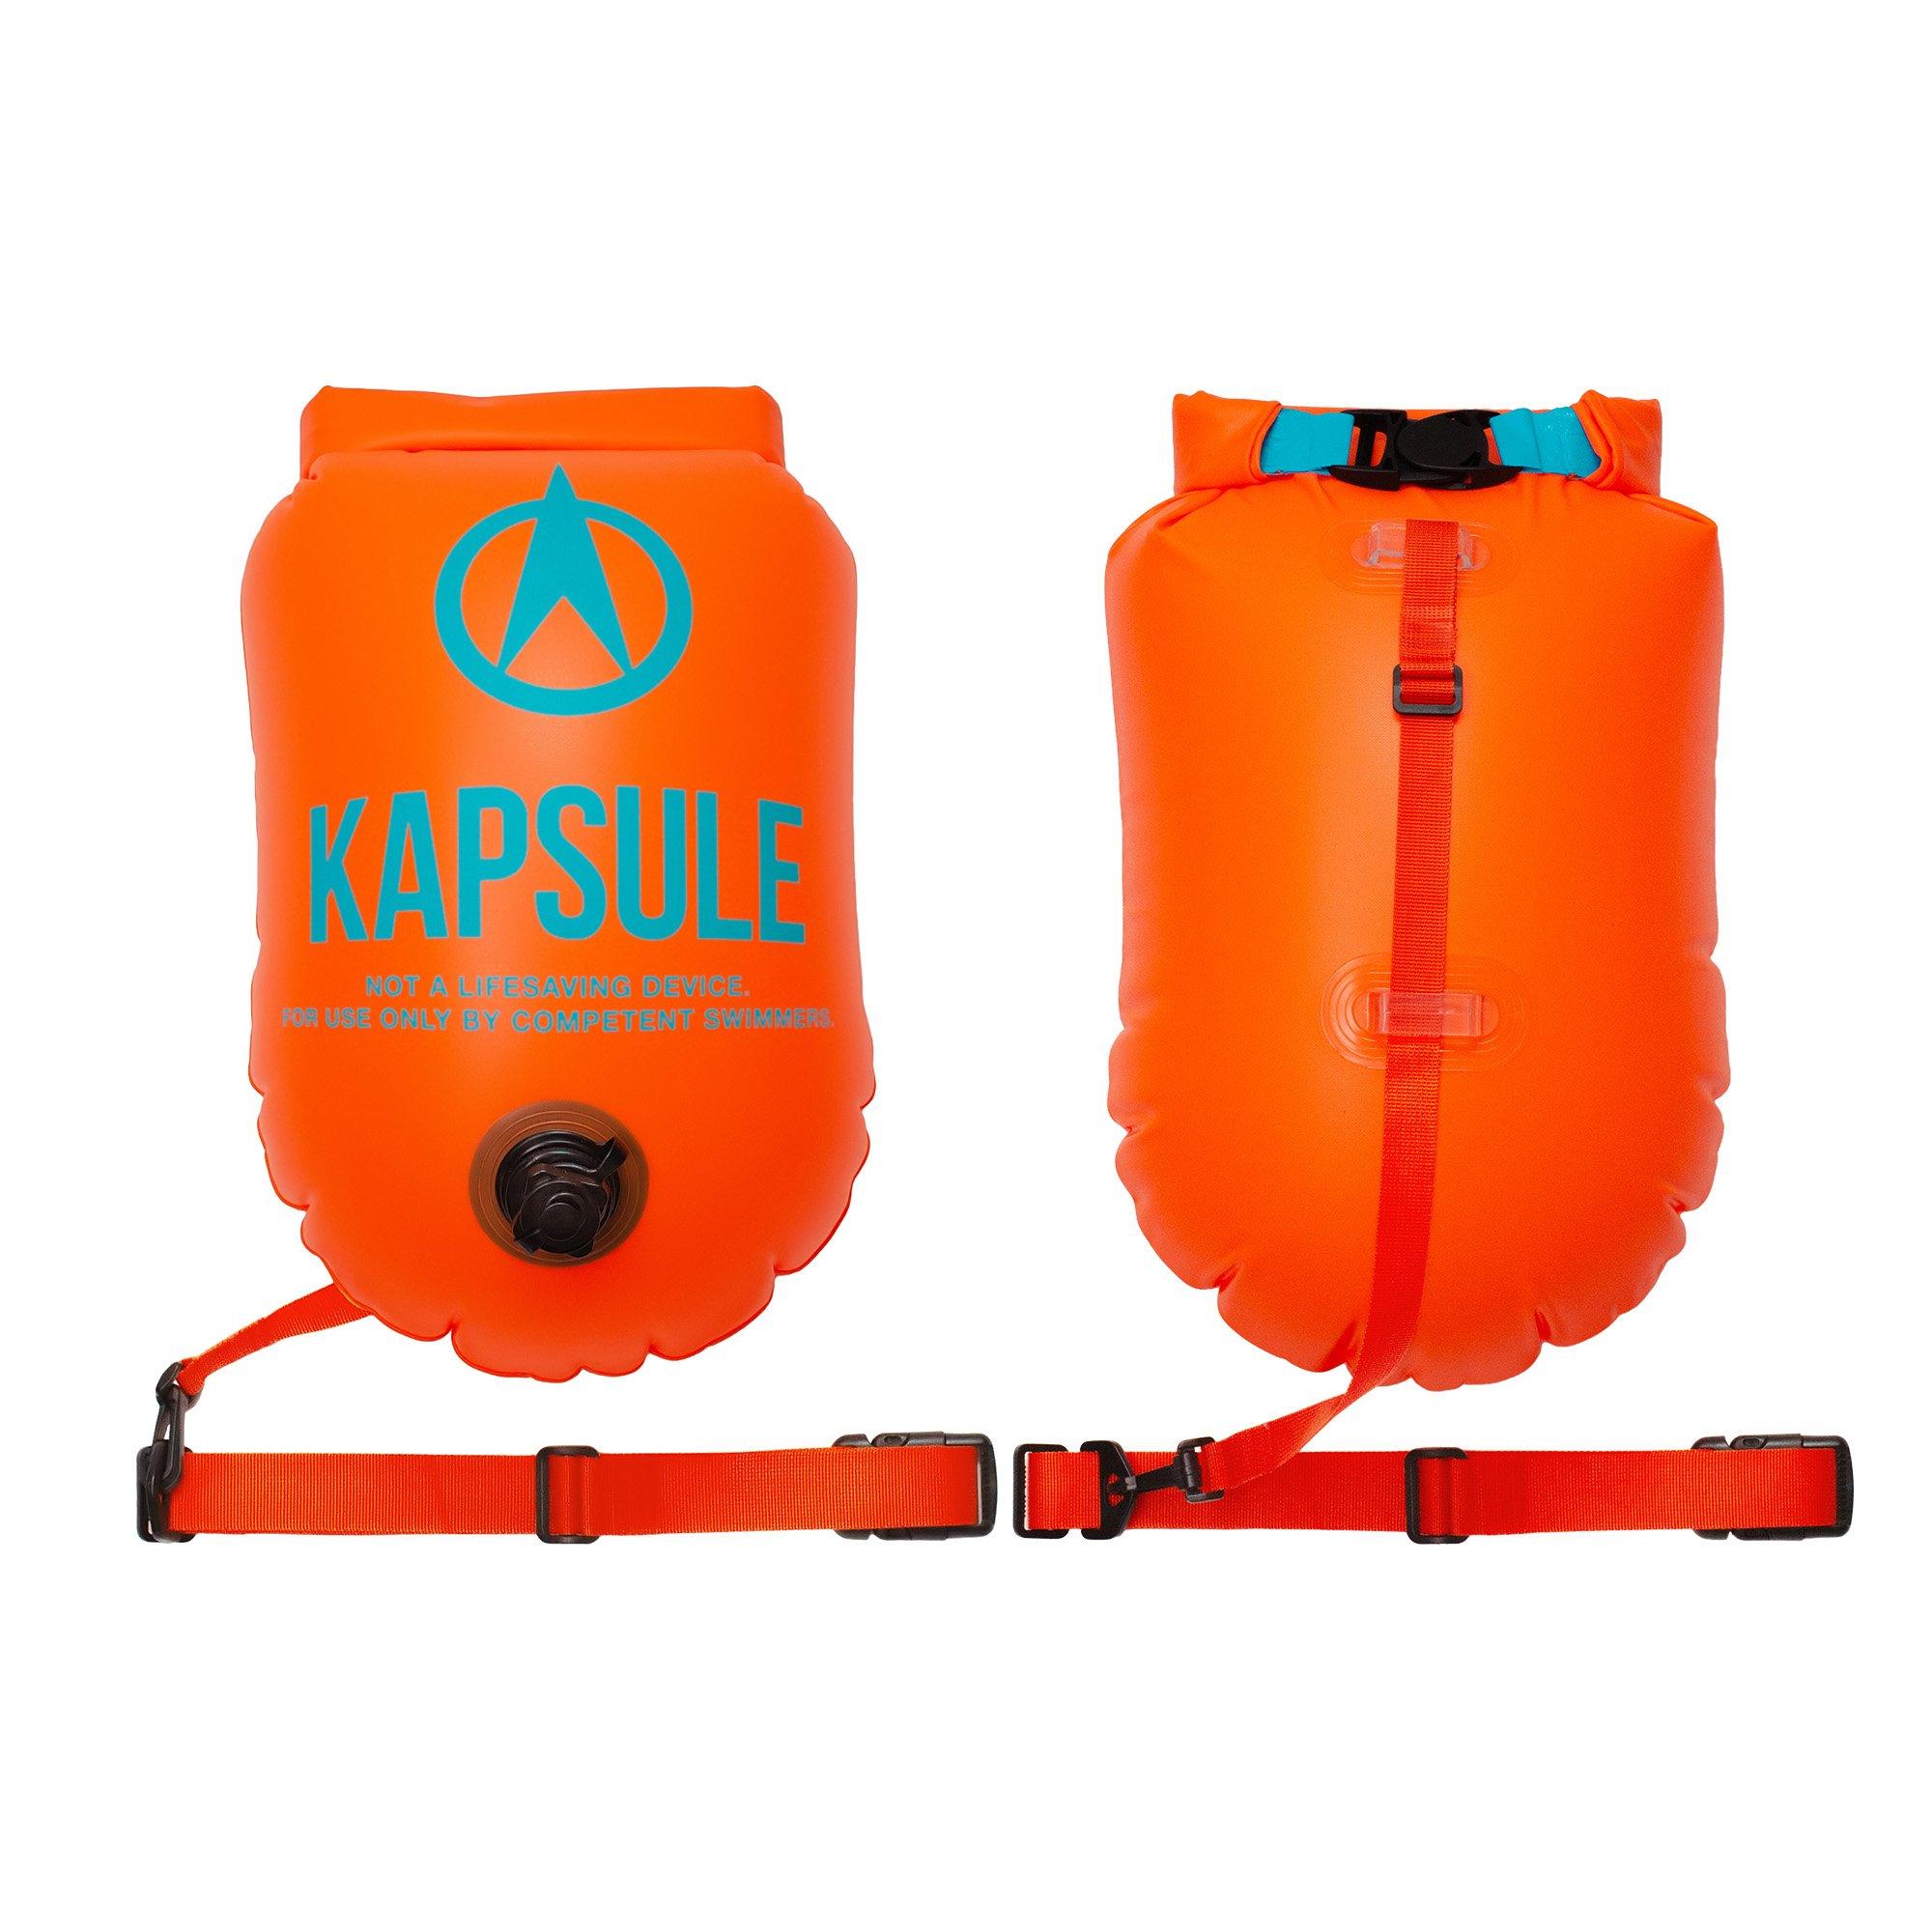 KAPSULE Swim Buoy (NEON 20L Orange) - Personal Swimming Float and Dry Bag by KAPSULE (Image #2)